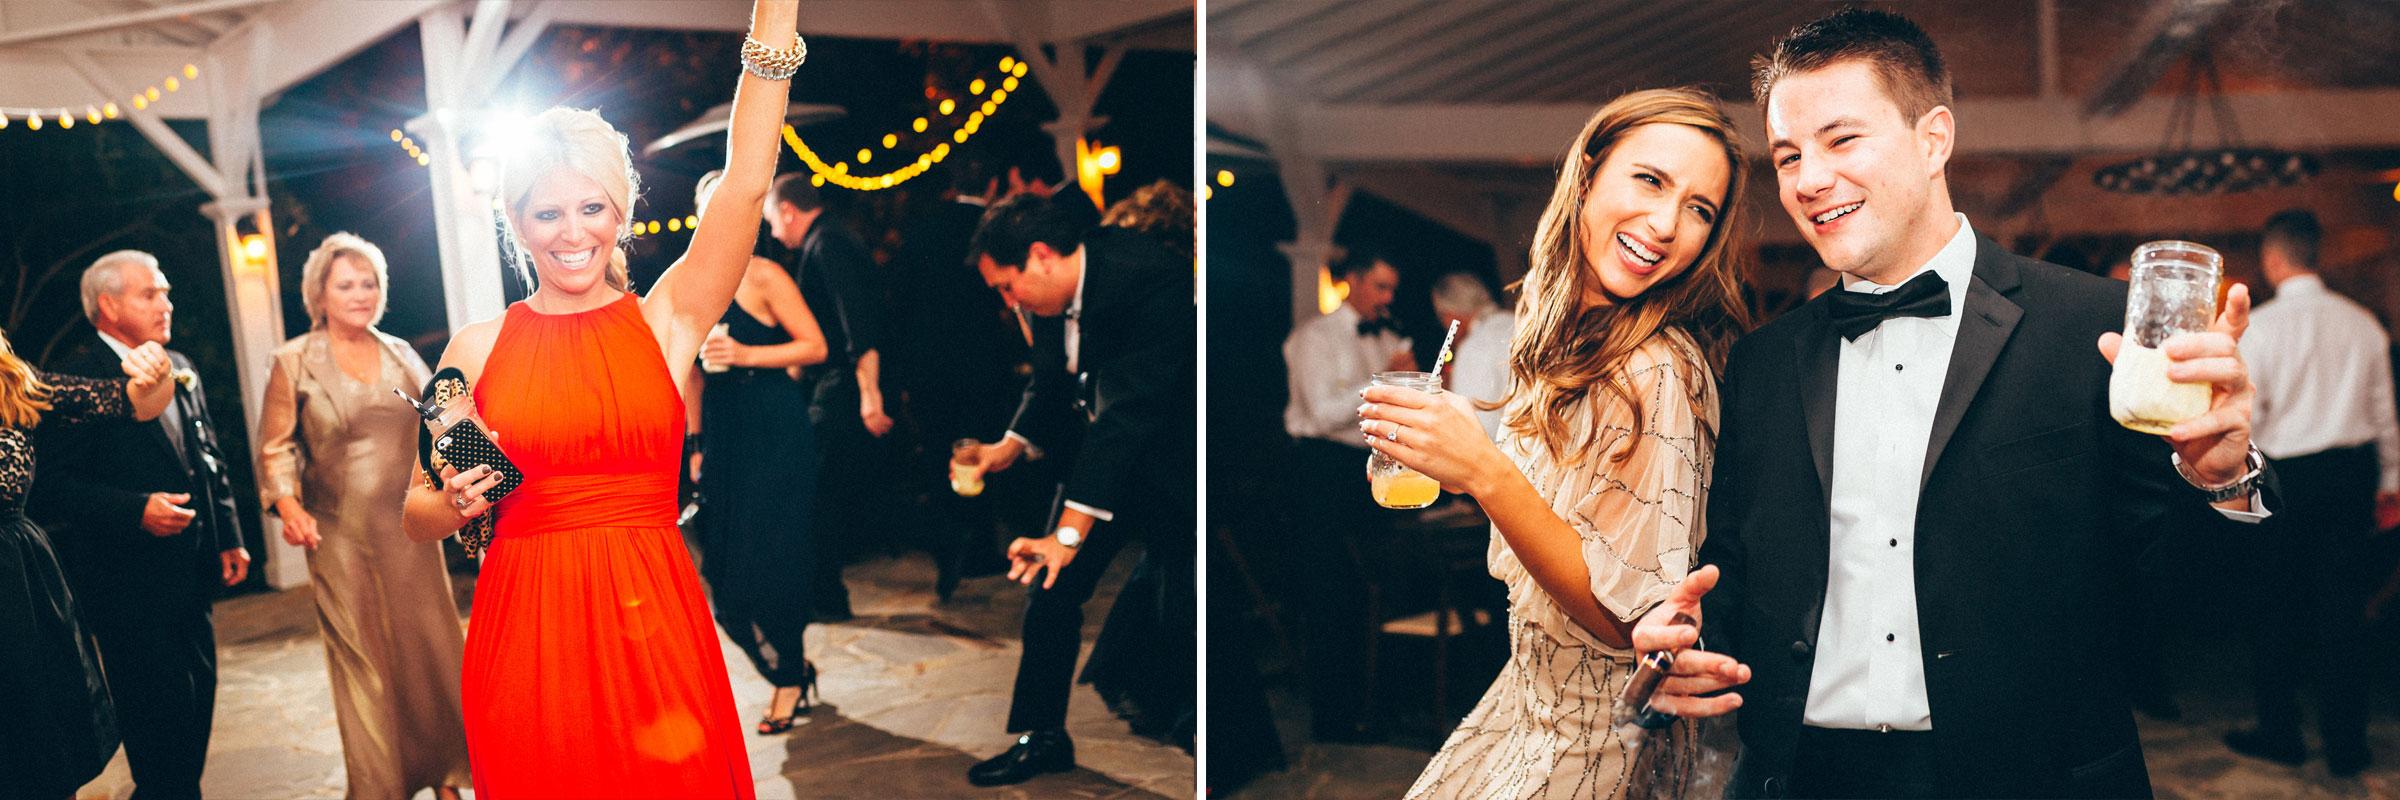 Me & Mr. Jones Wedding, Reception at Cedarwood in Nashville, Gold Wedding, Funny Wedding Photos